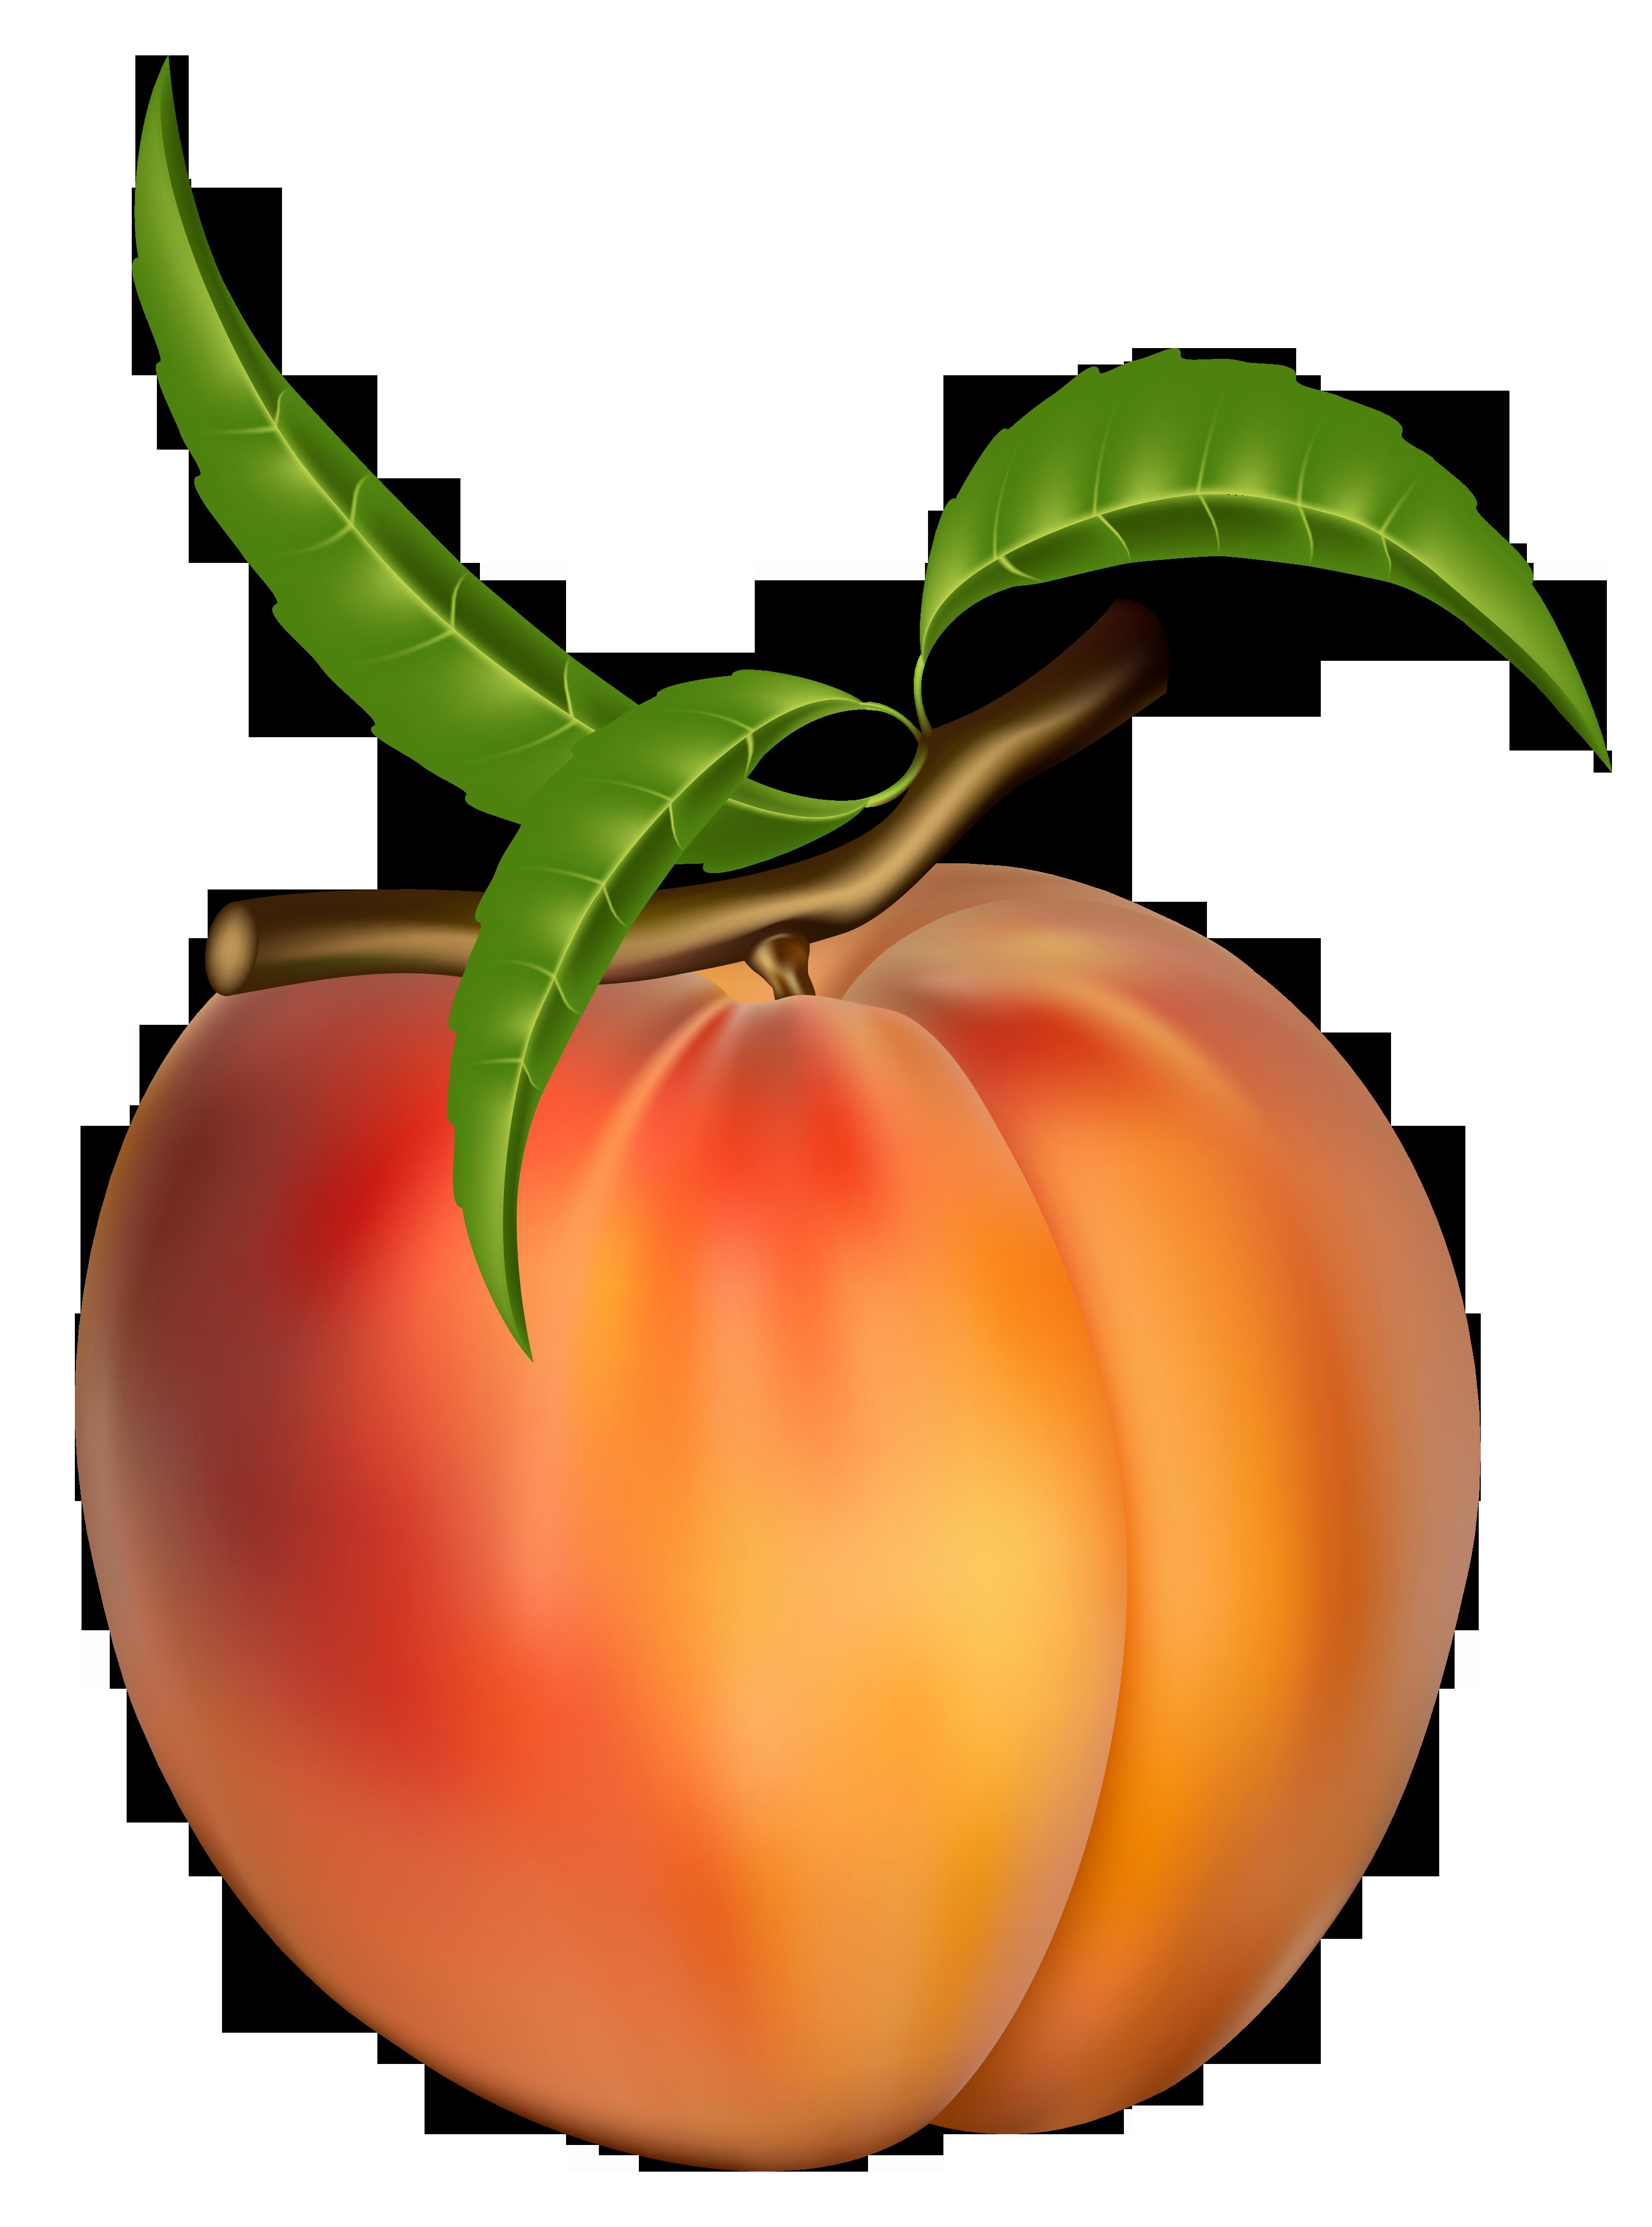 Peach Clip Art images